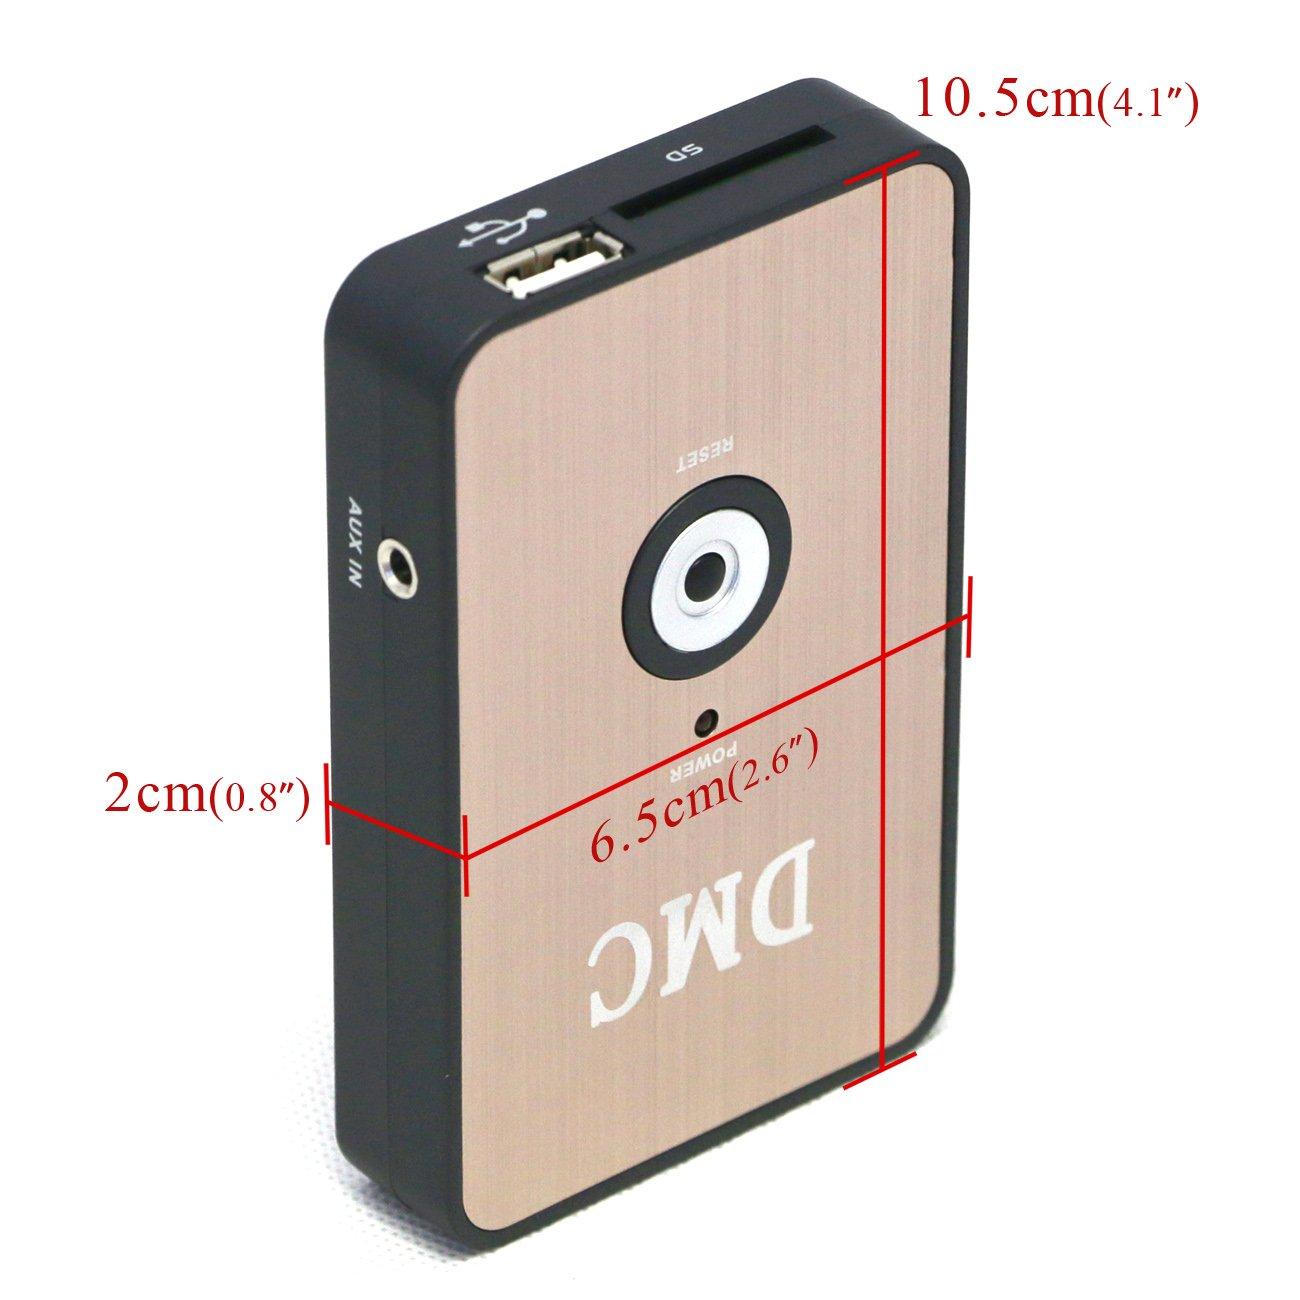 Digital Music Changer Player Media CD Changer MP3 for Honda GOLDWING 1800 GL1800 2001-2015 by COBIKE (Image #3)